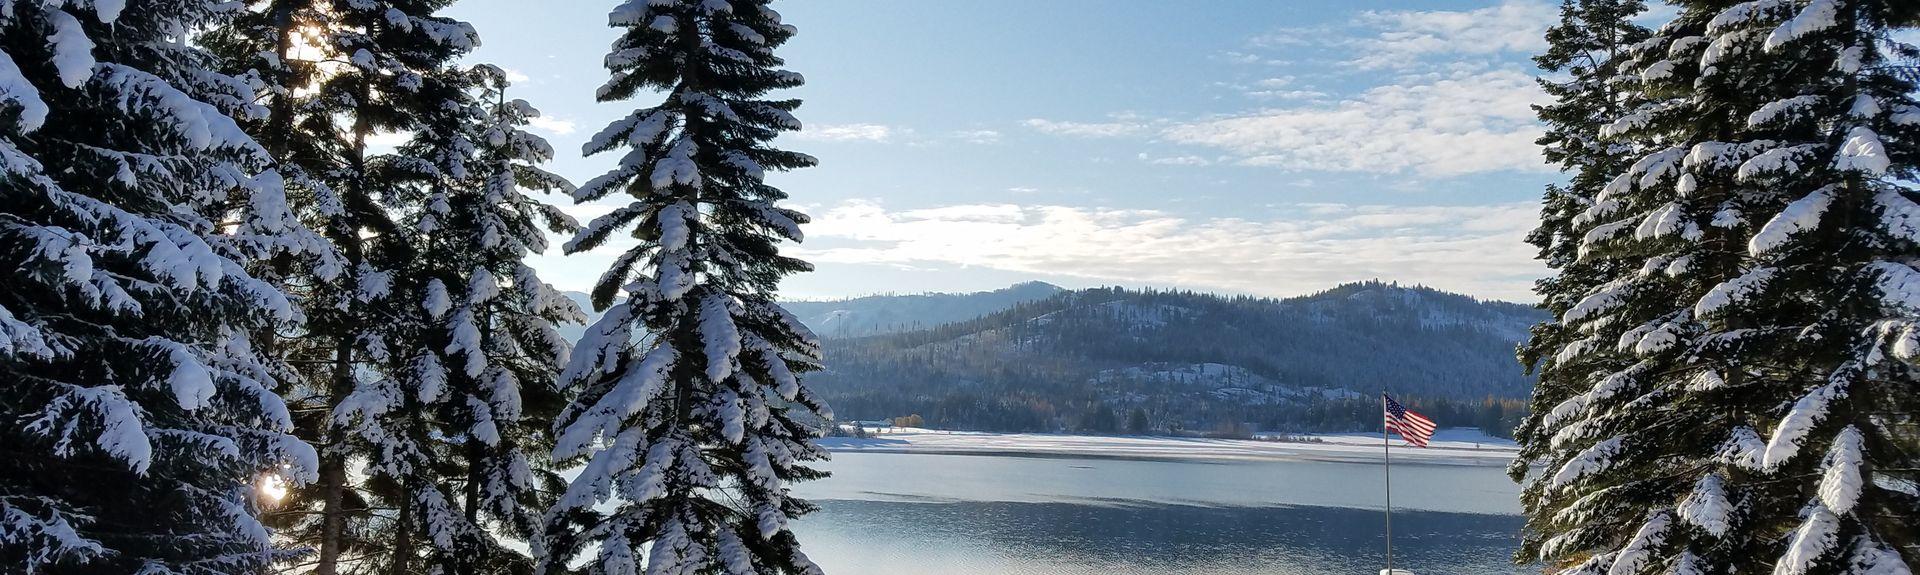 Laclede, Idaho, United States of America